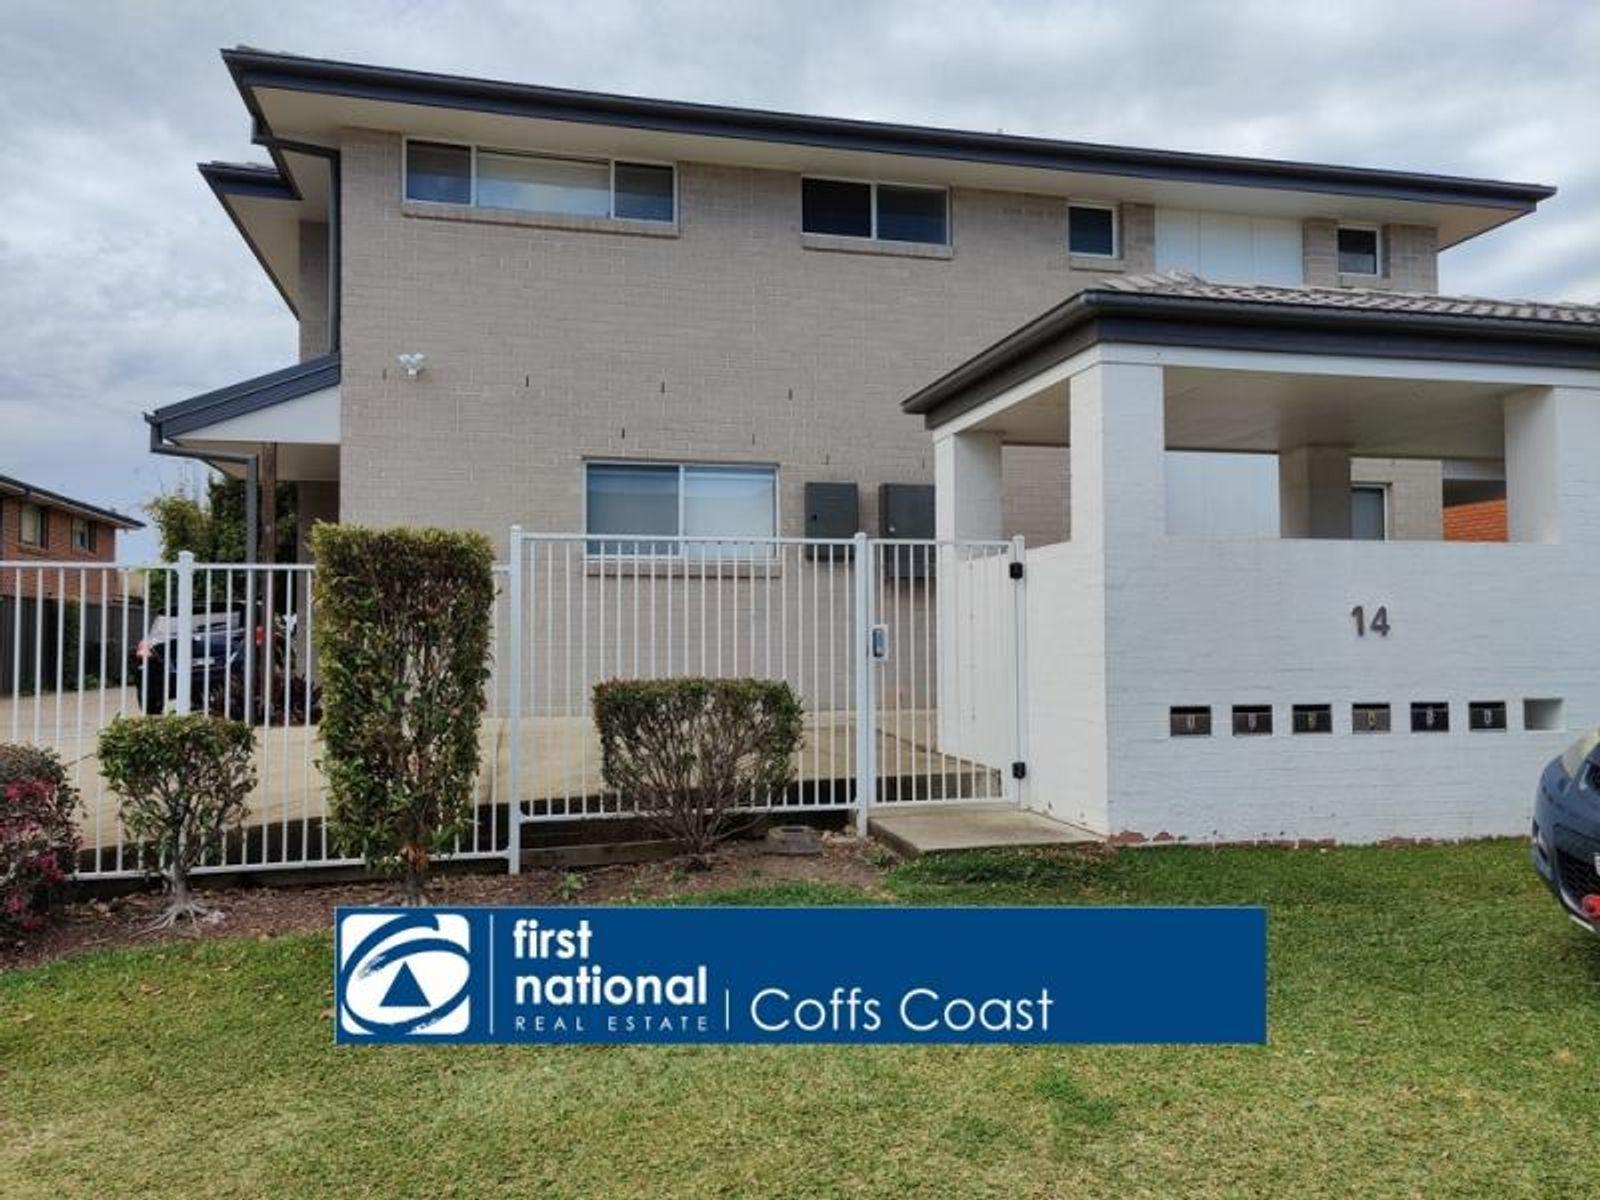 1/14 San Francisco Avenue, Coffs Harbour, NSW 2450